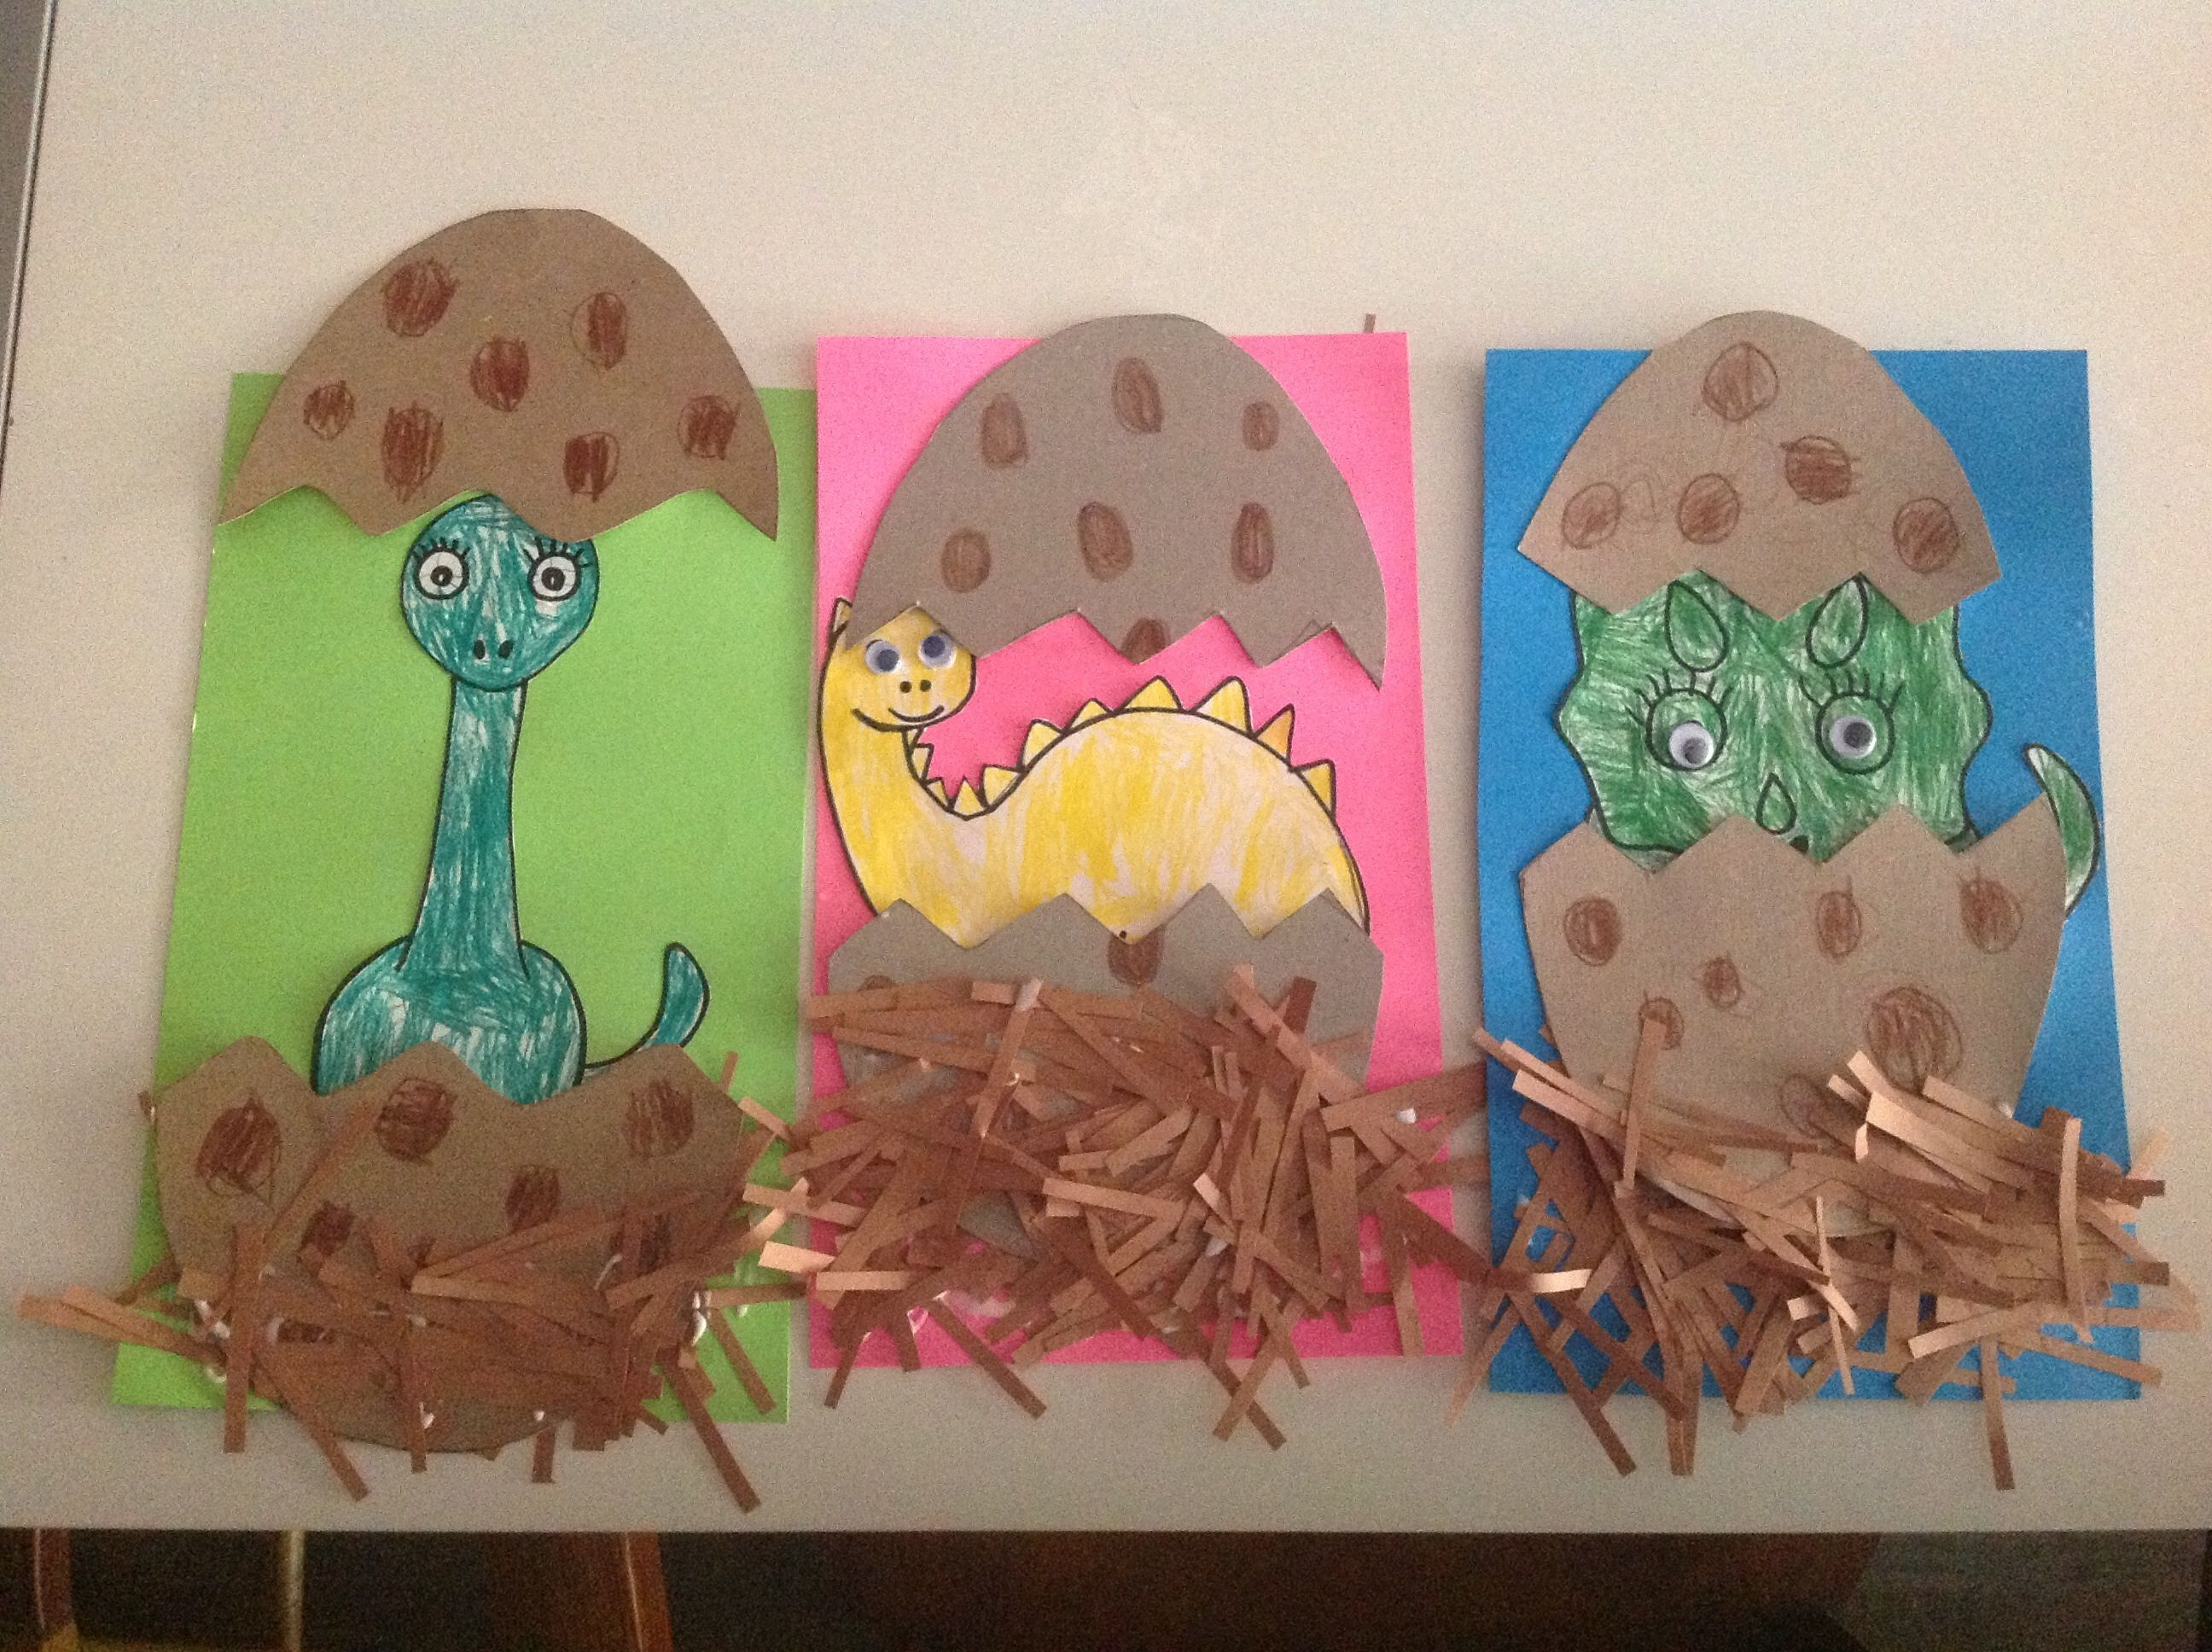 Marvelous Dinosaur Craft Ideas For Kids Part - 7: Dinosaur Craft - Kids, Preschool, Kindergarten Dinosaur Theme